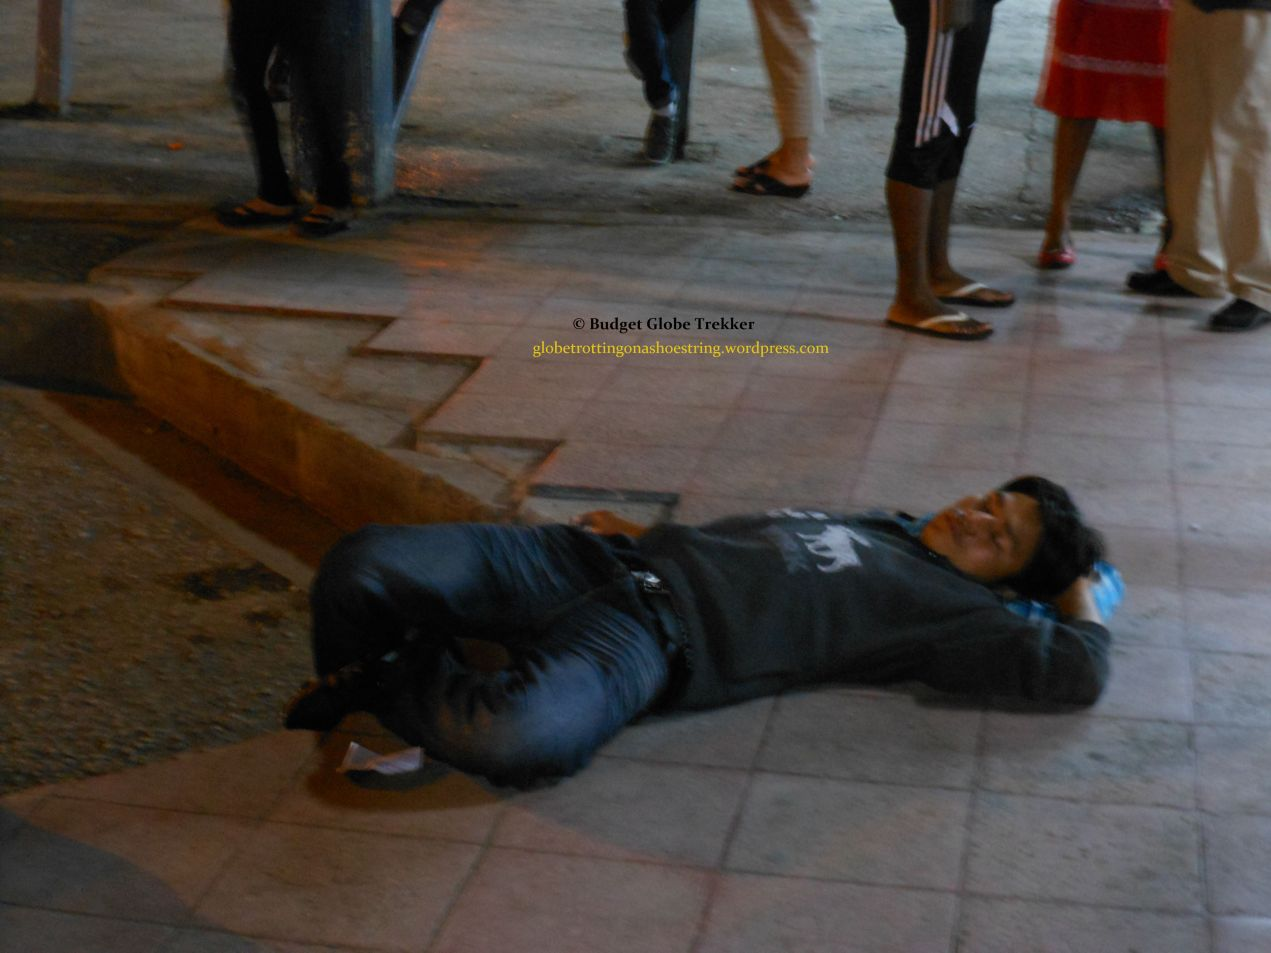 Drunkman at overland border crossing: Costa Rica into Panama?